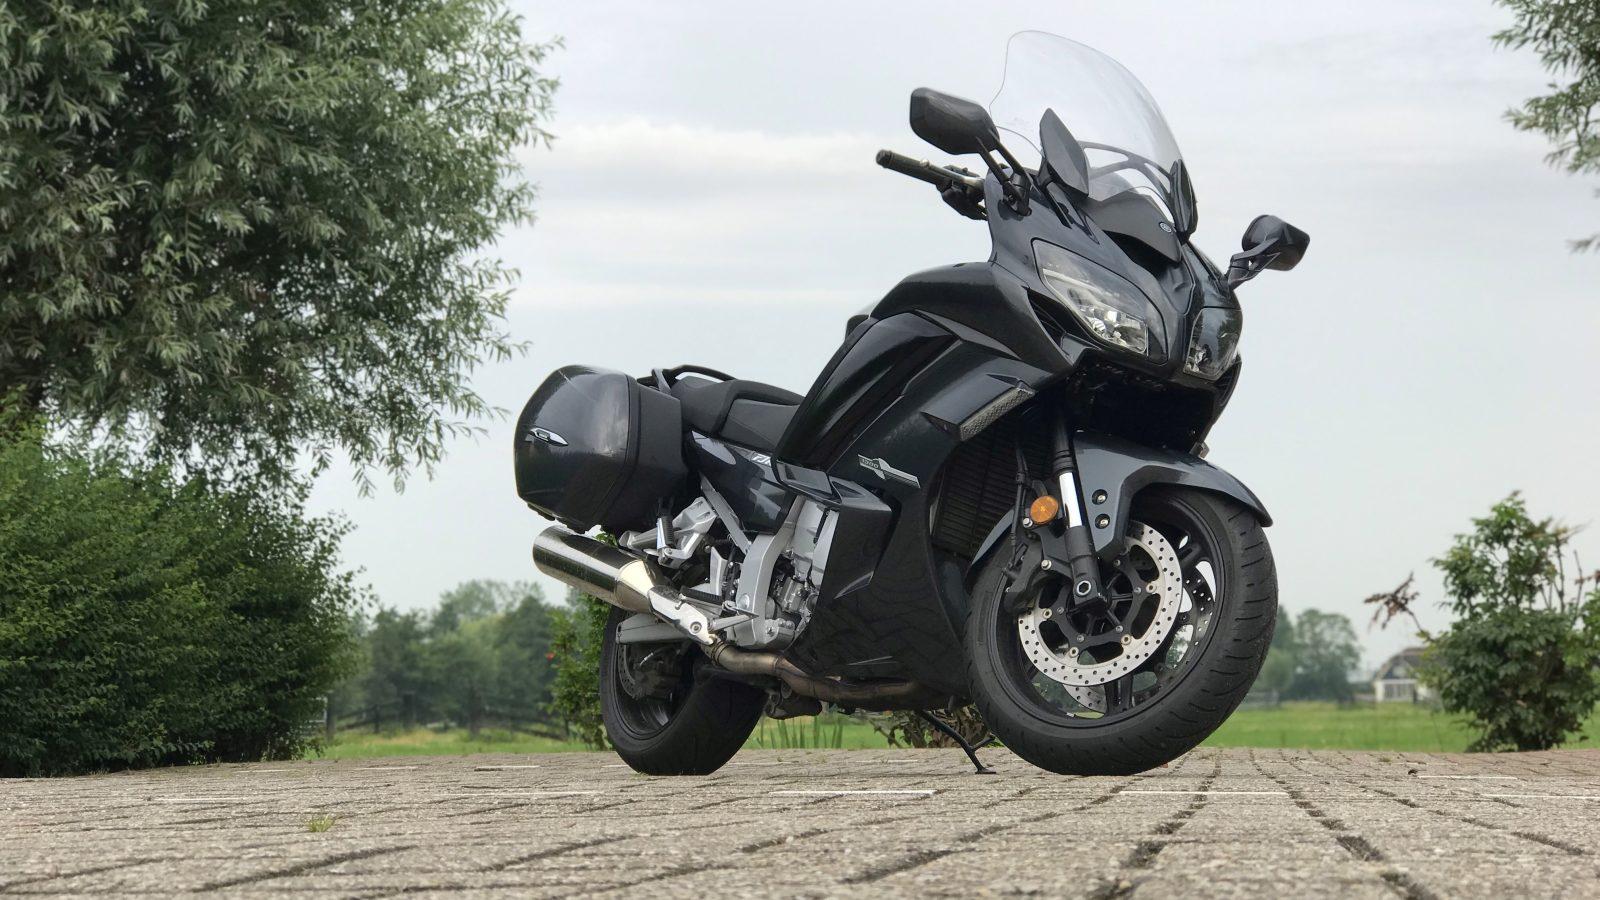 Yamaha FJR1300AS 2019 - Test MotorRAI.nl